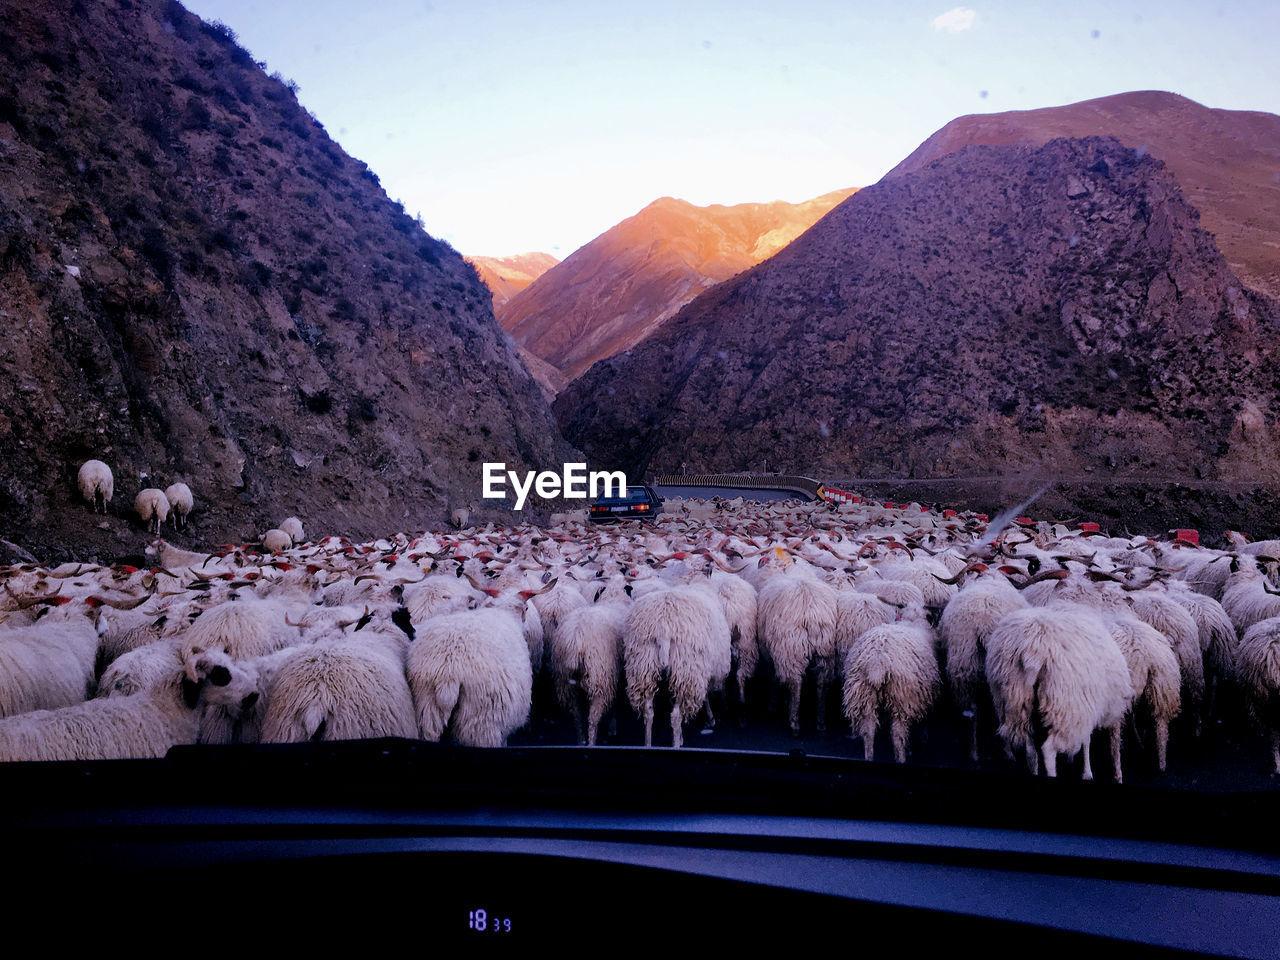 Sheep Walking On Street Seen Through Car Windshield